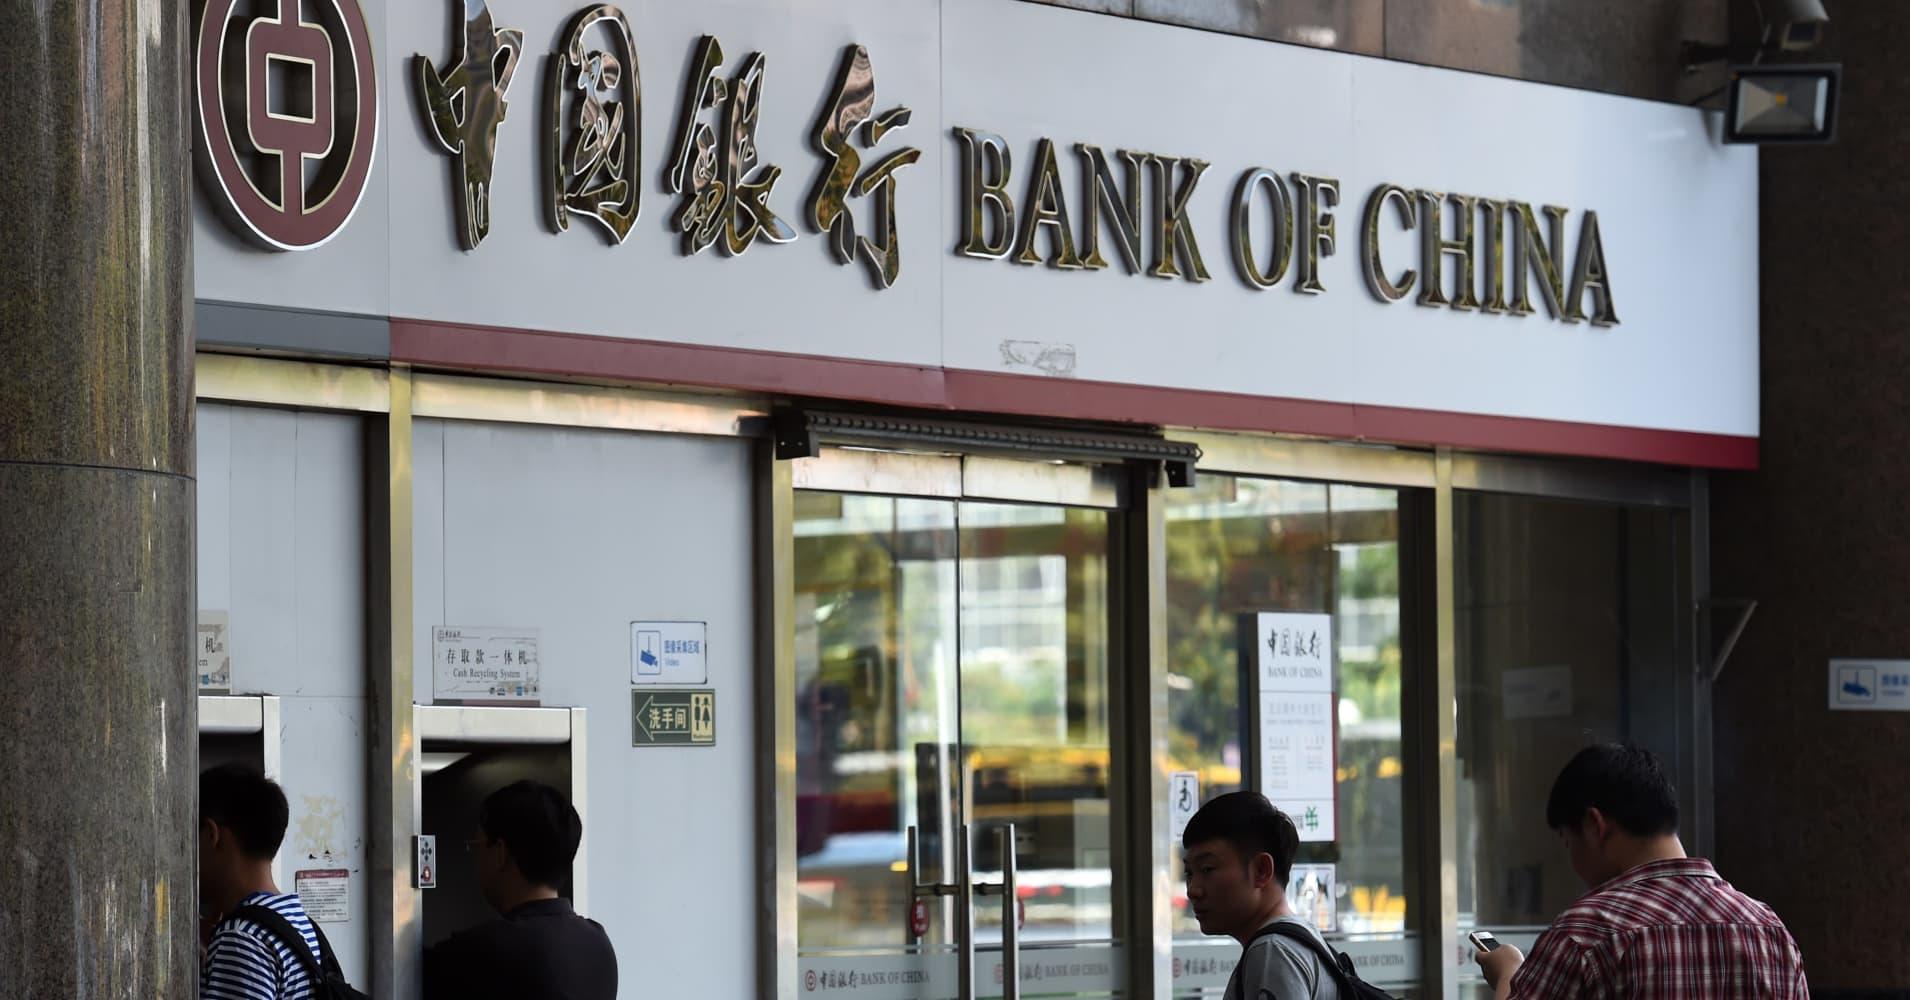 Bank of China offers $300 million loan to Sri Lanka